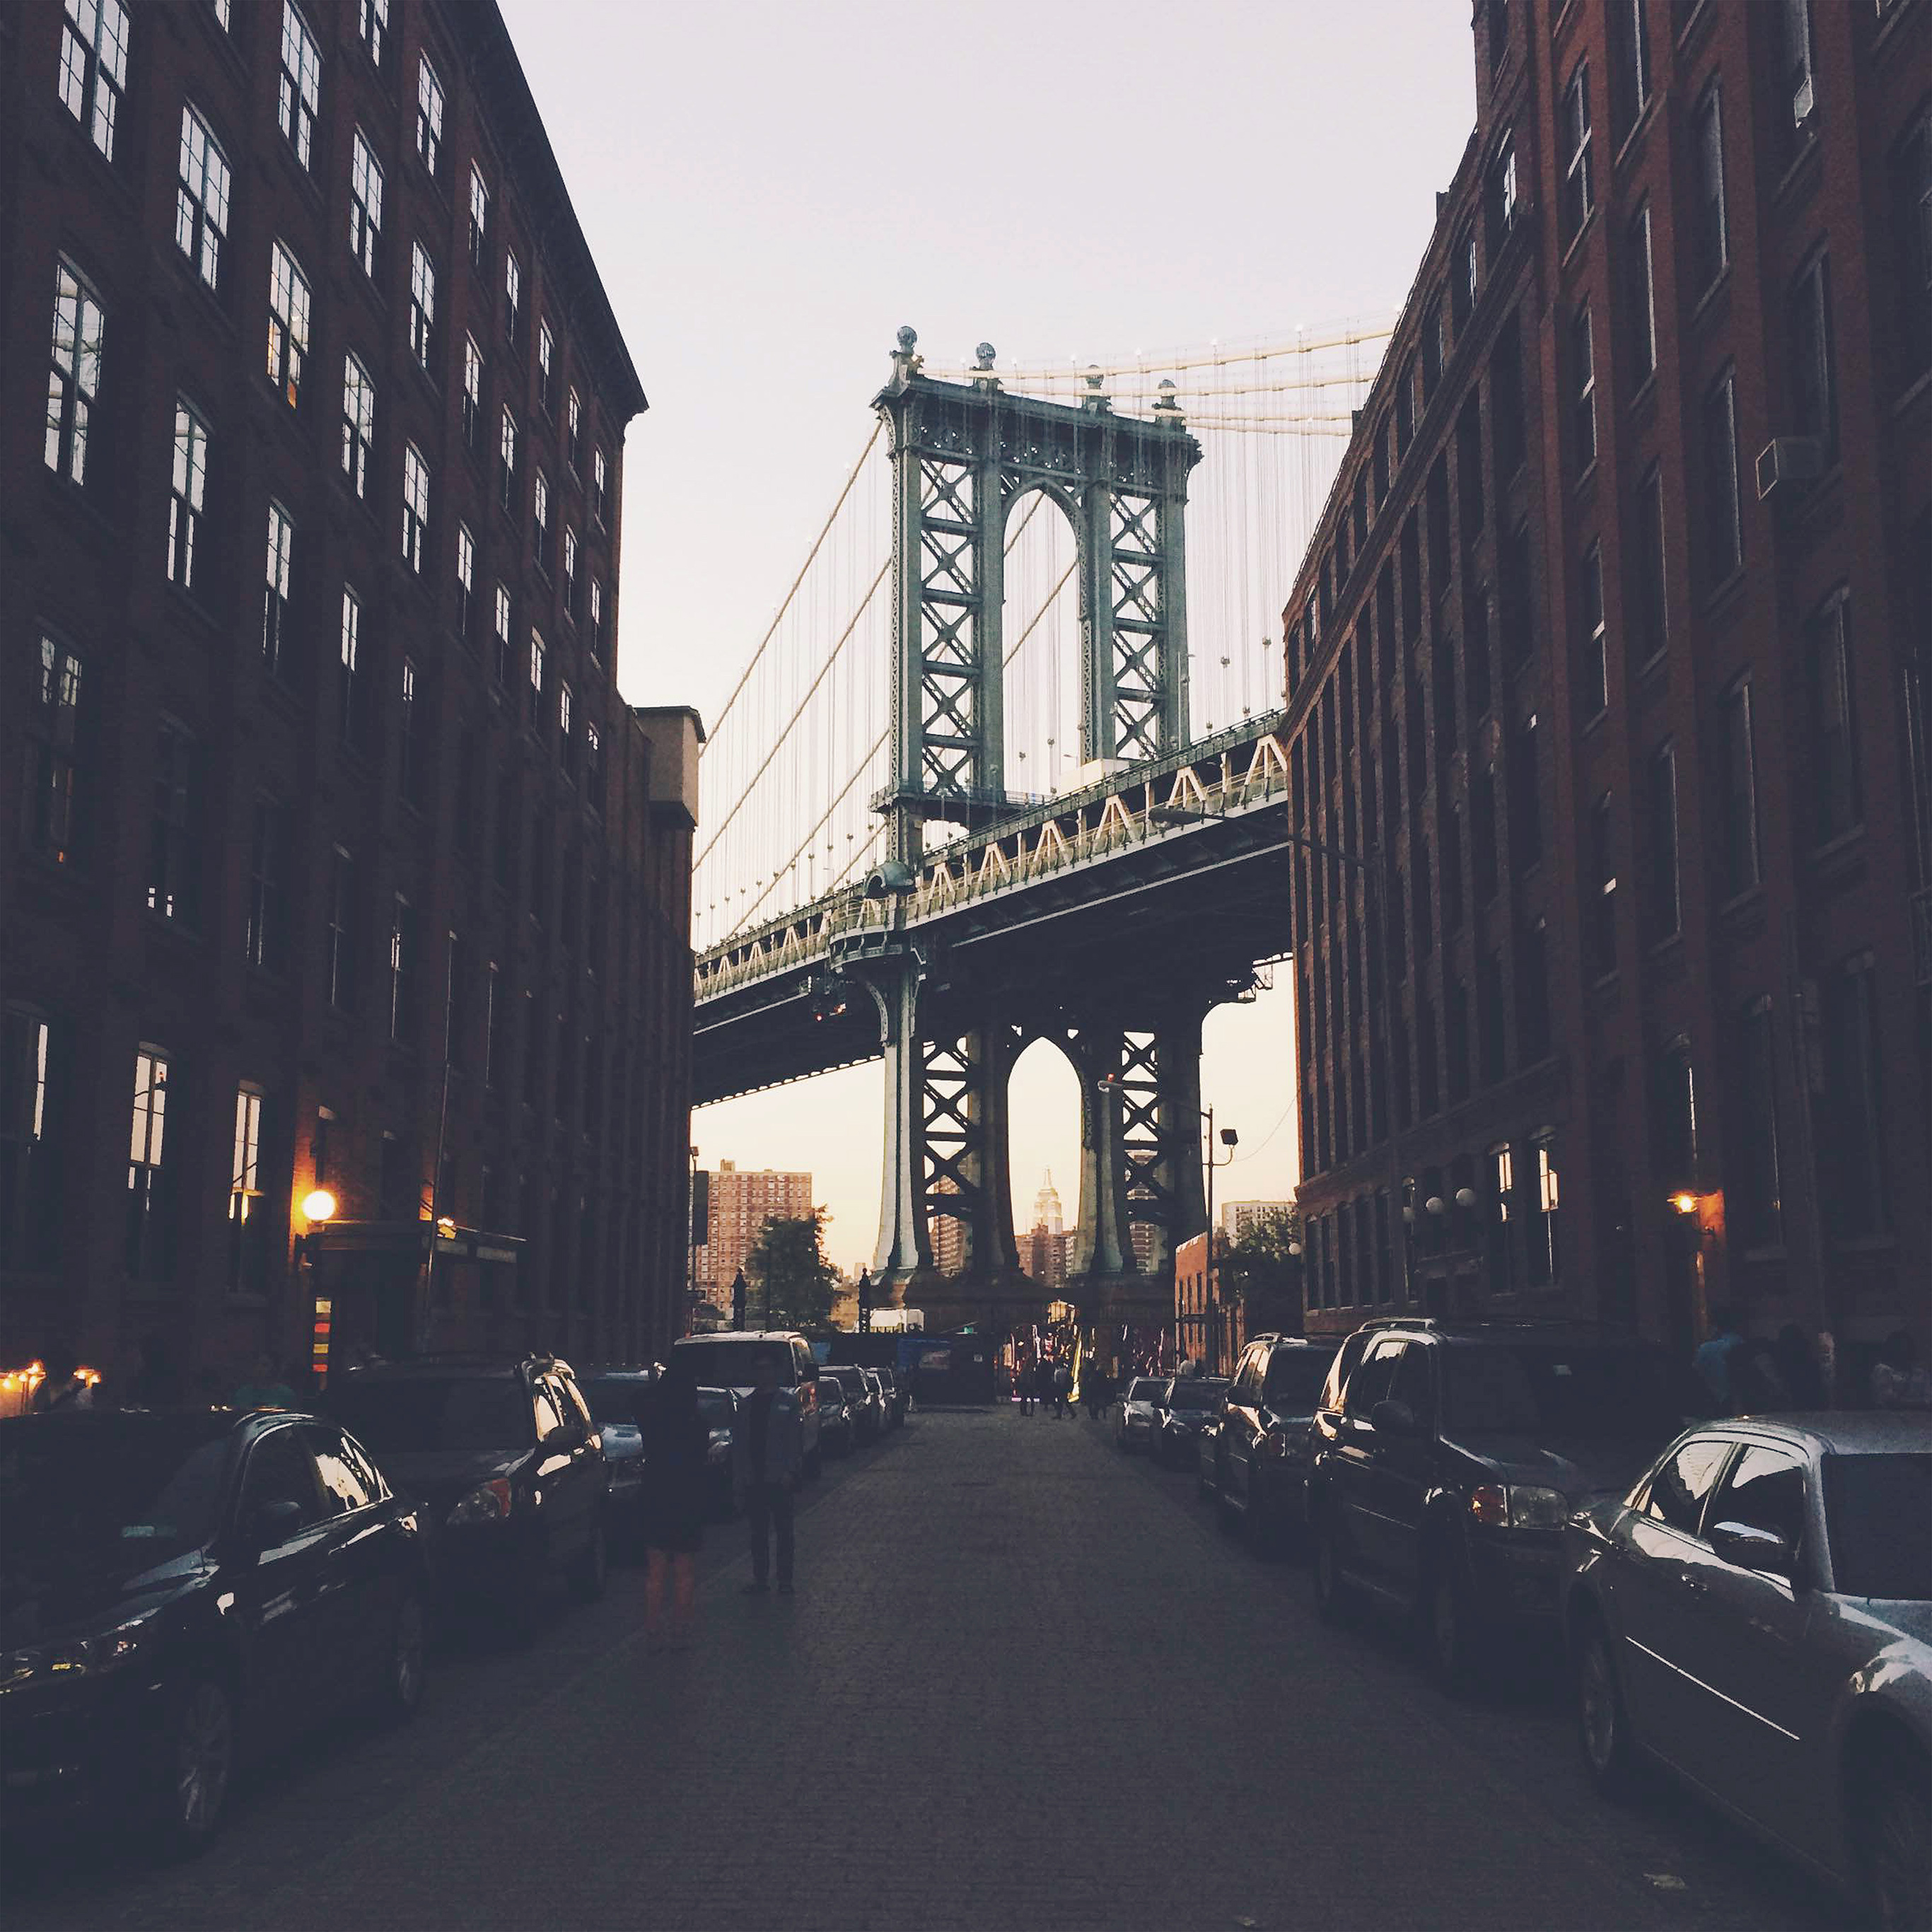 Mx42 Newyork Bridge City Building Architecture Street Papers Co